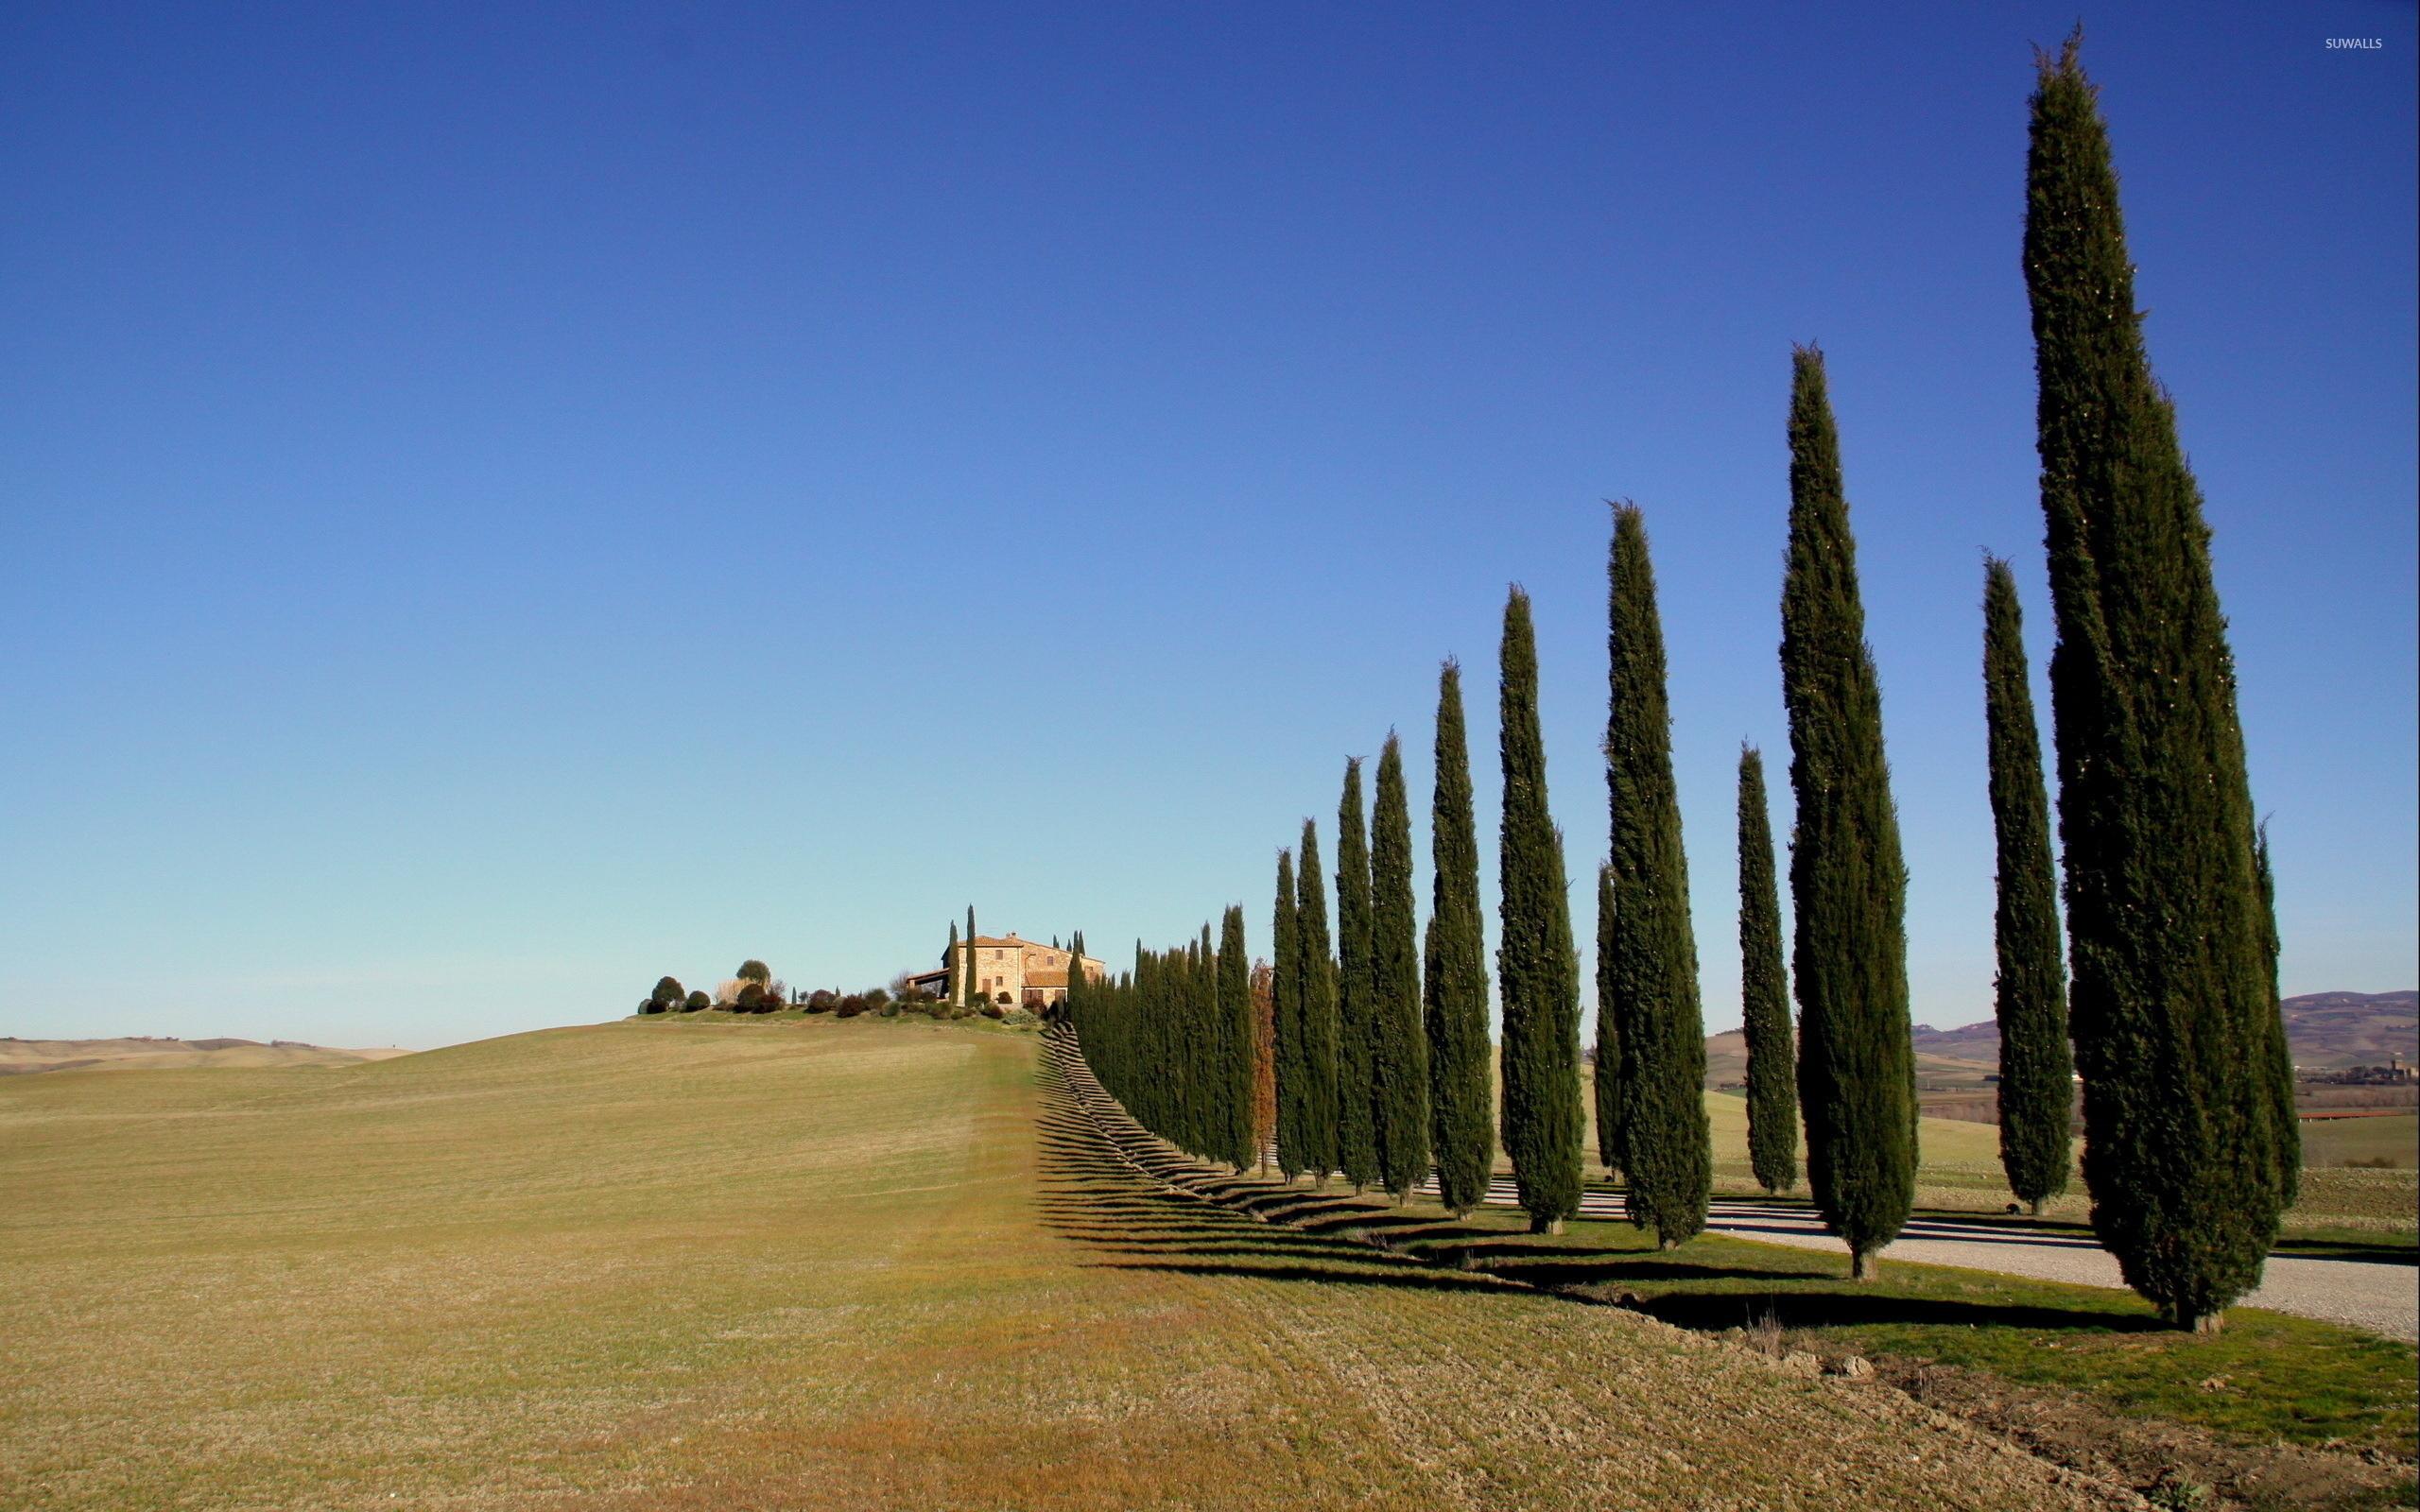 Tuscany 2 Wallpaper World Wallpapers 41737